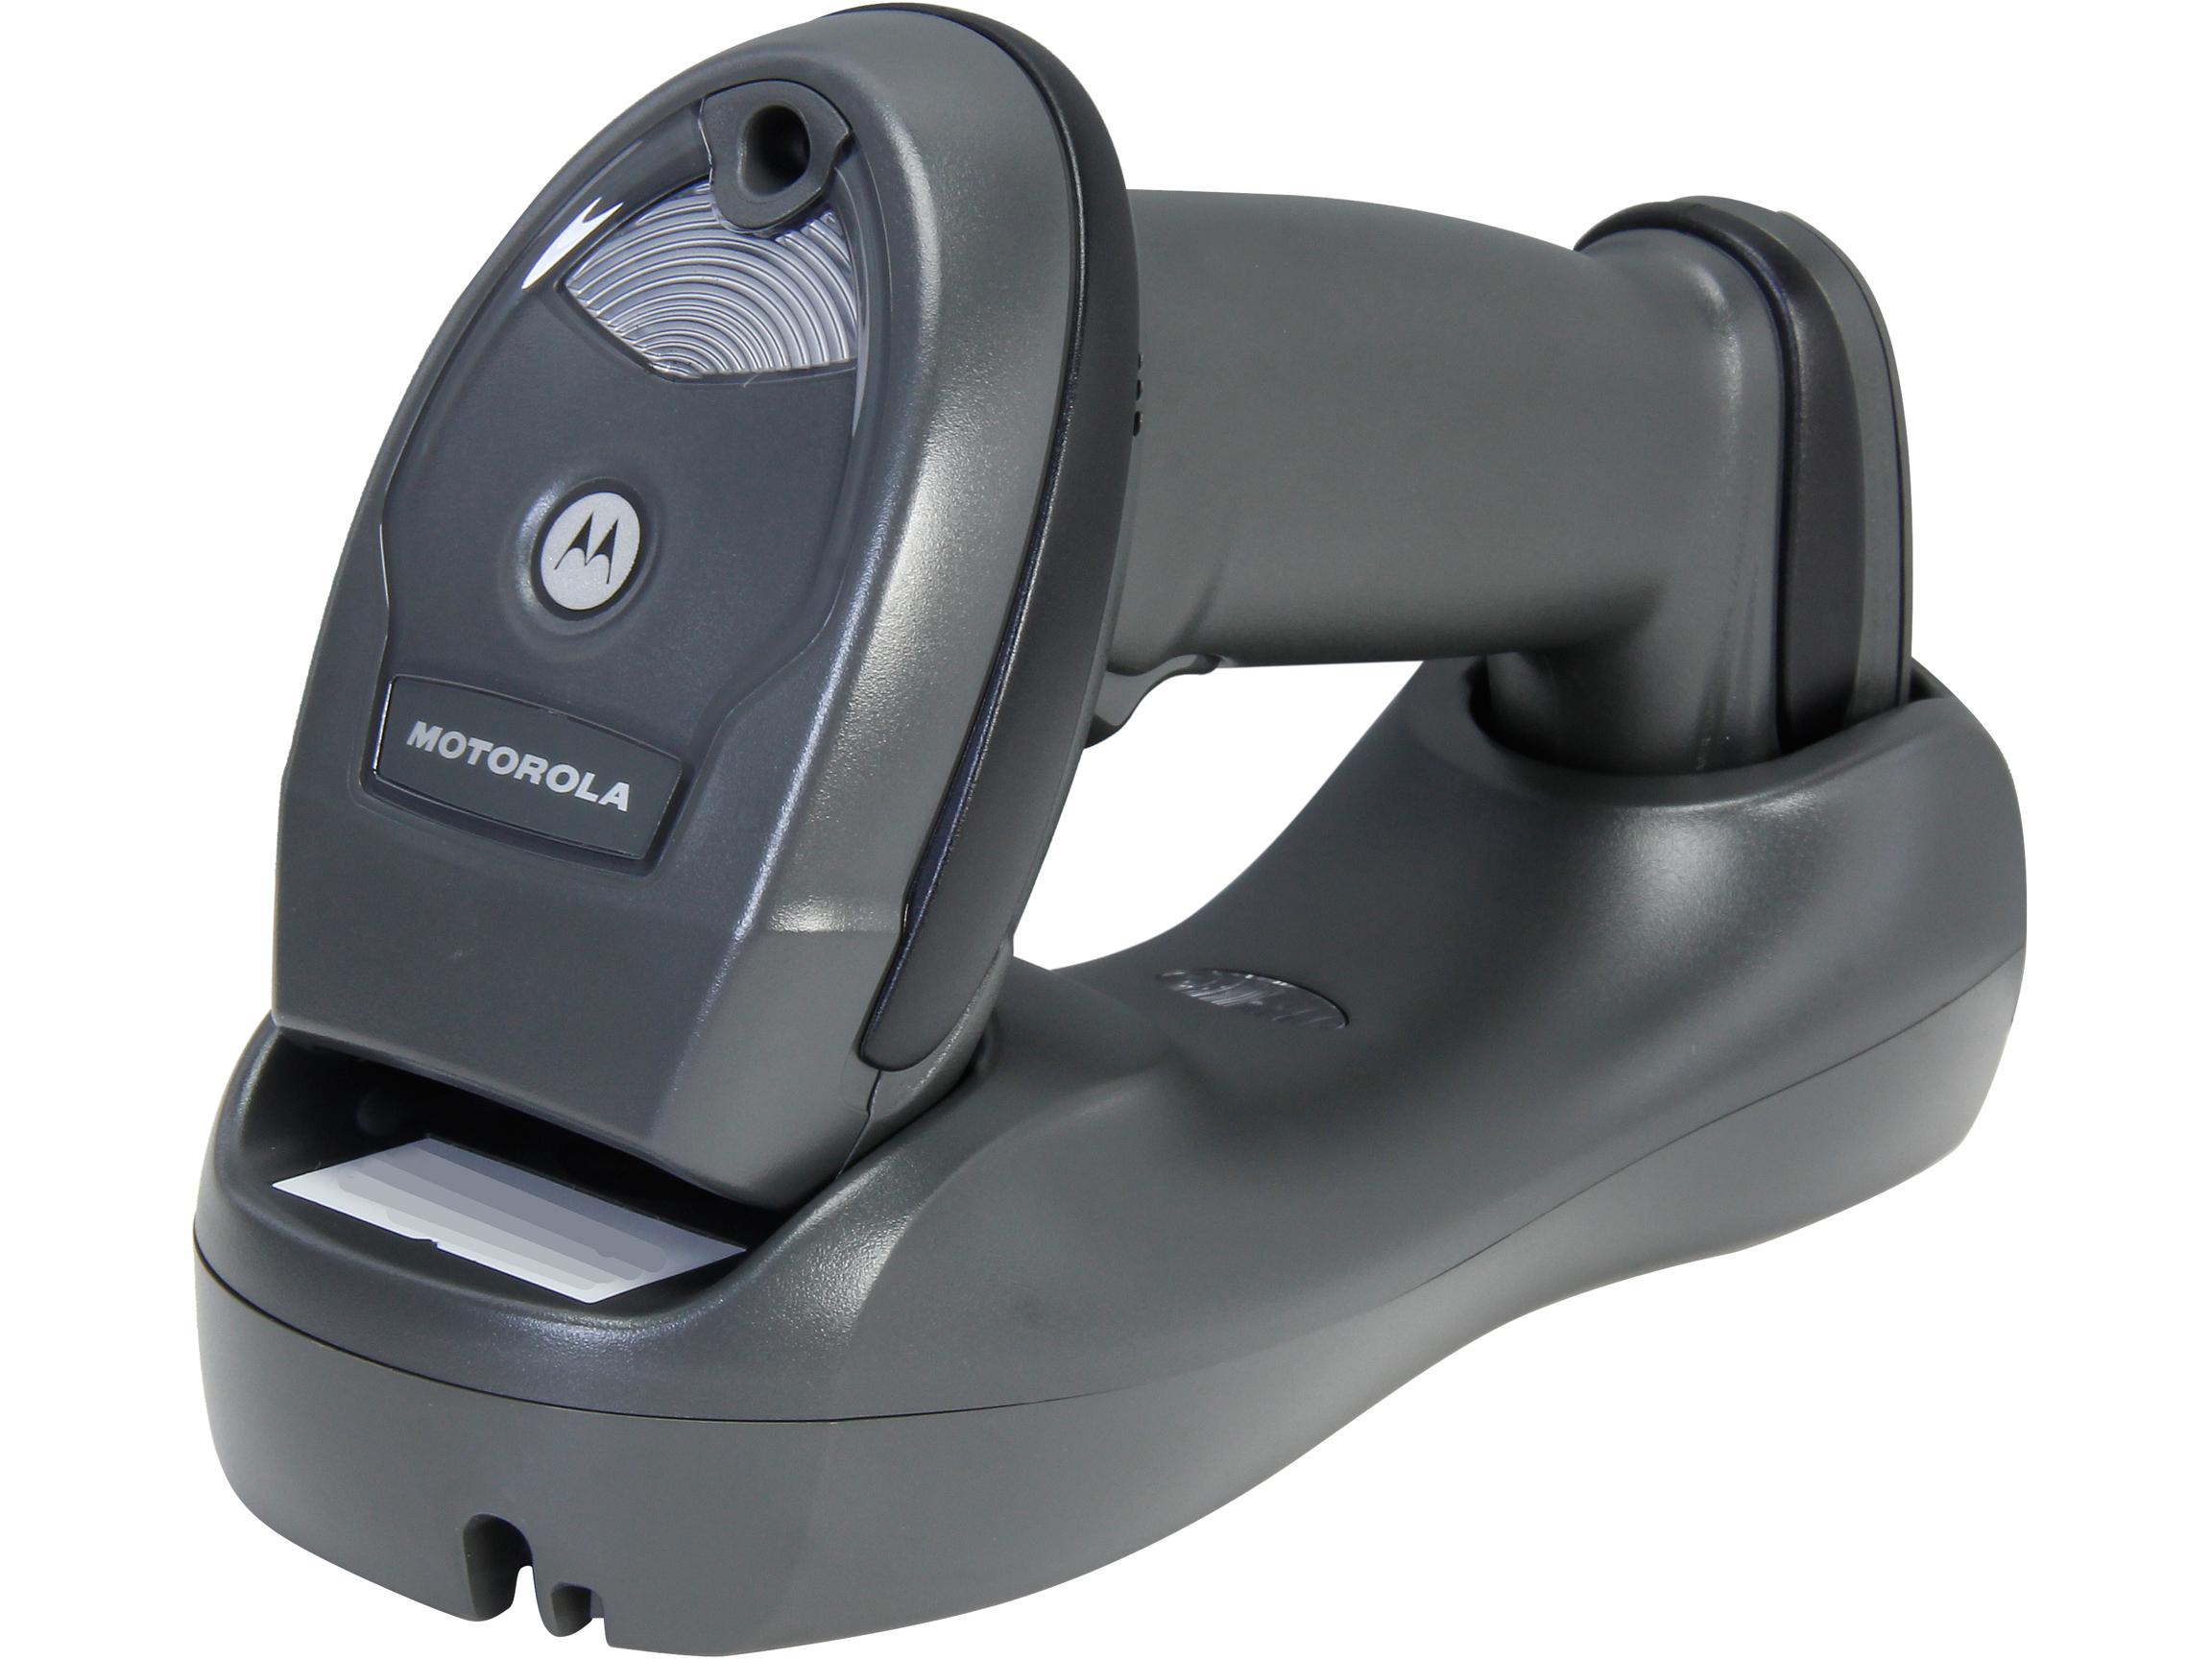 Zebra Motorola  LI4278 Handheld Barcode Scanner - Black